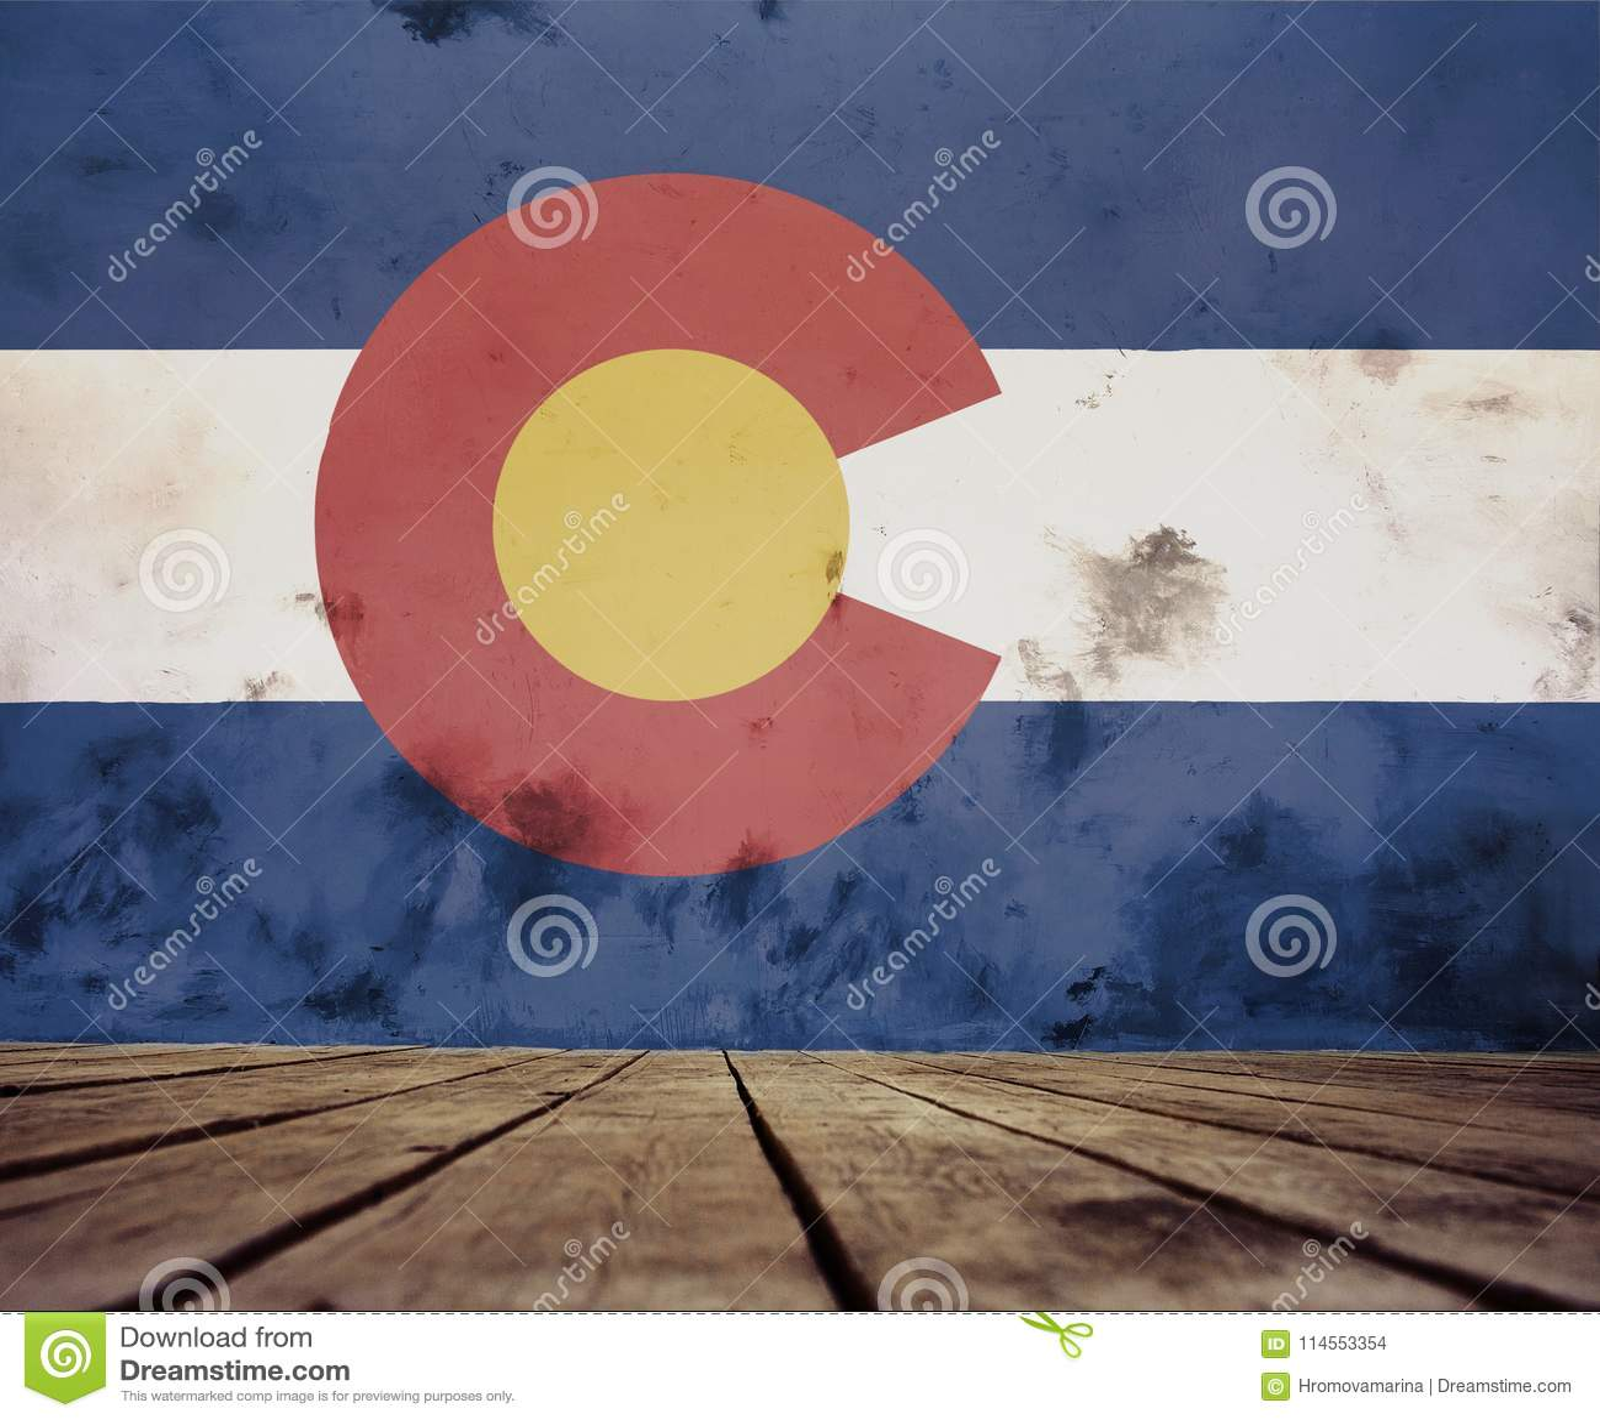 A painted Colorado flag.